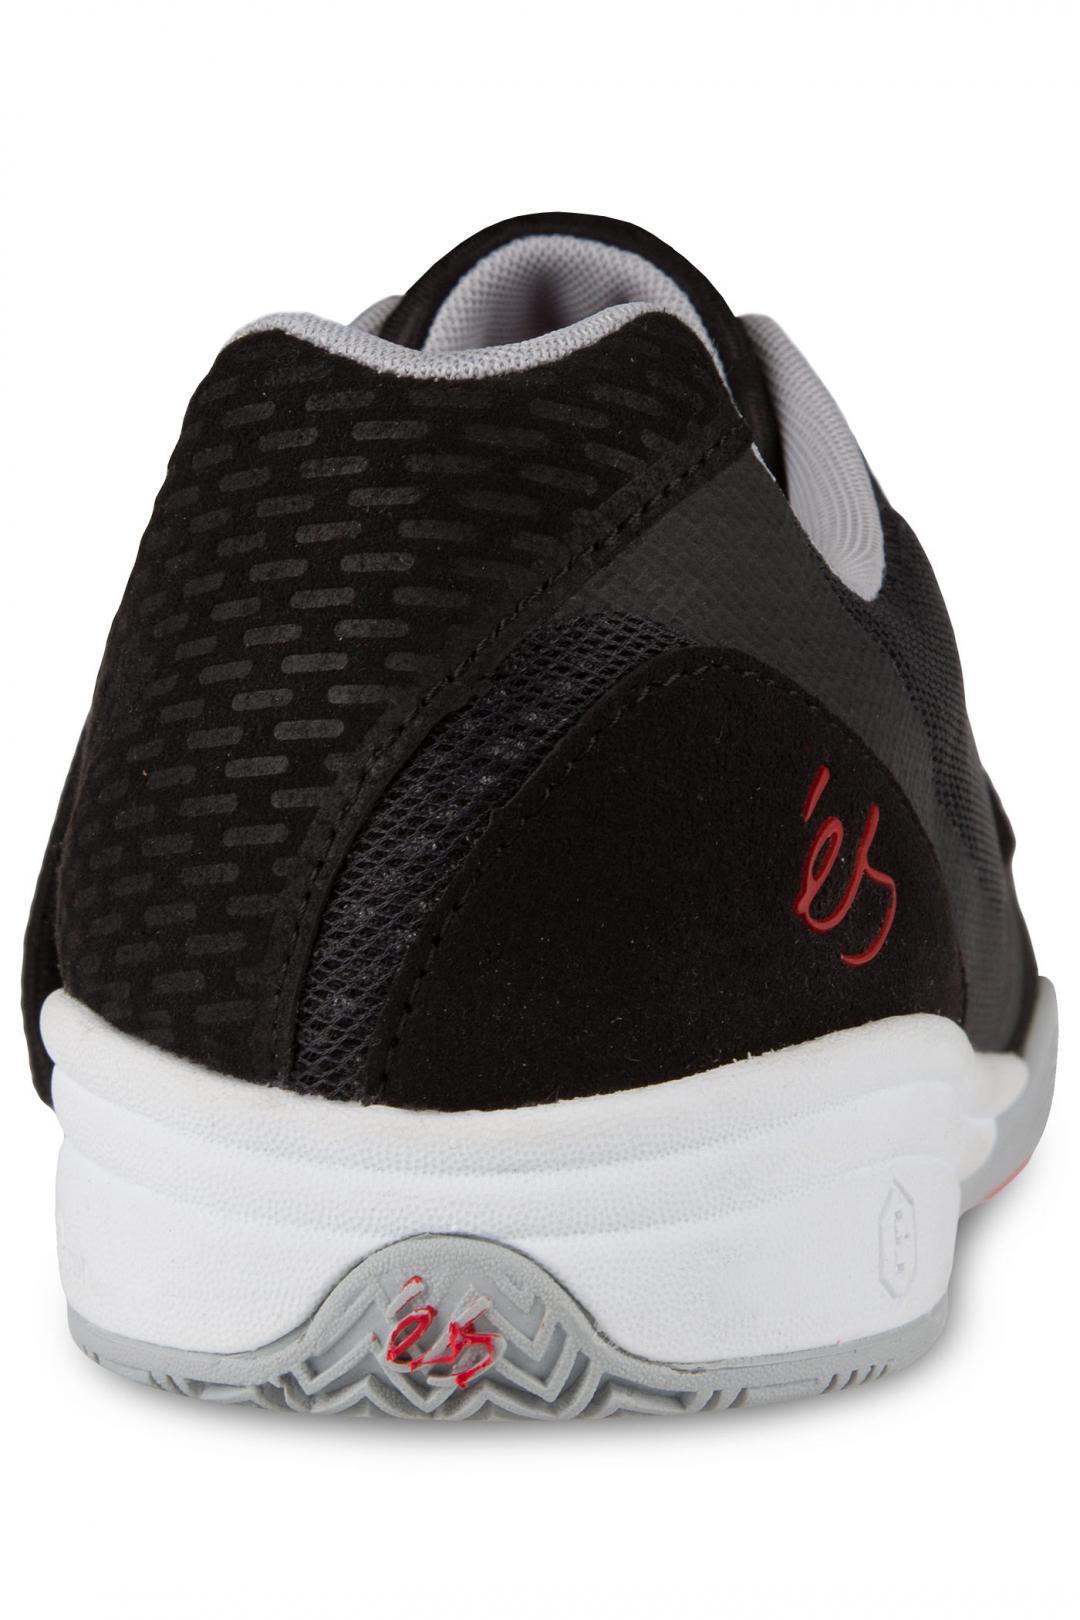 Uomo éS Sesla black grey red | Sneaker